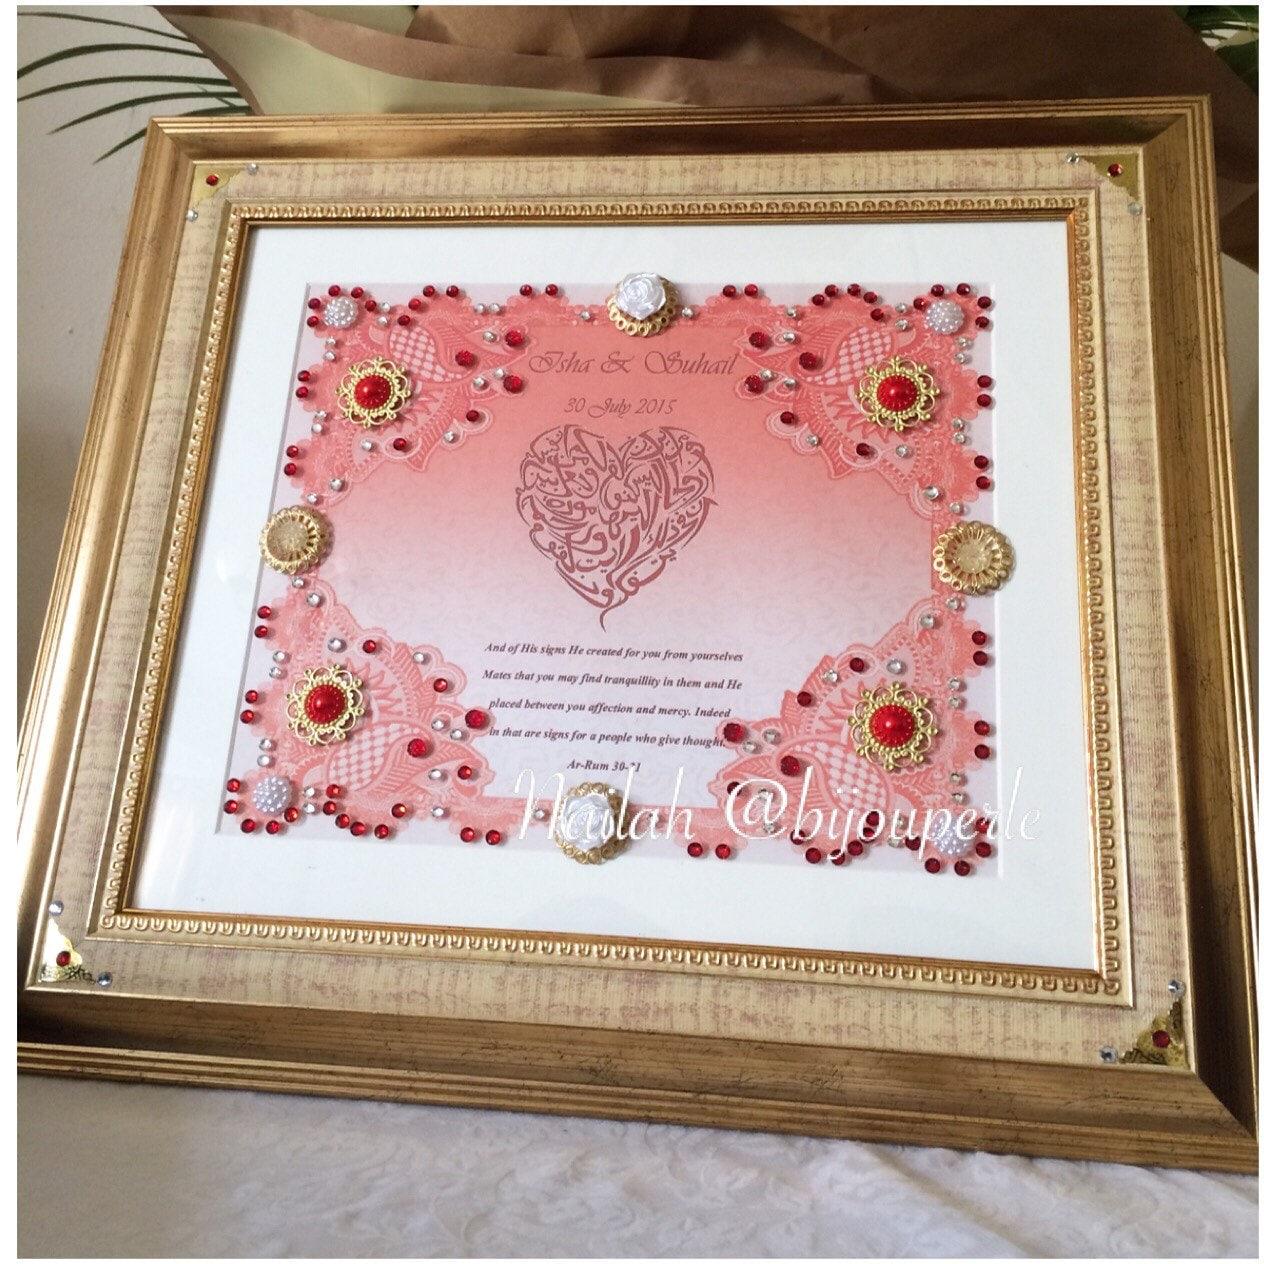 Islamic wedding frame gift | Etsy